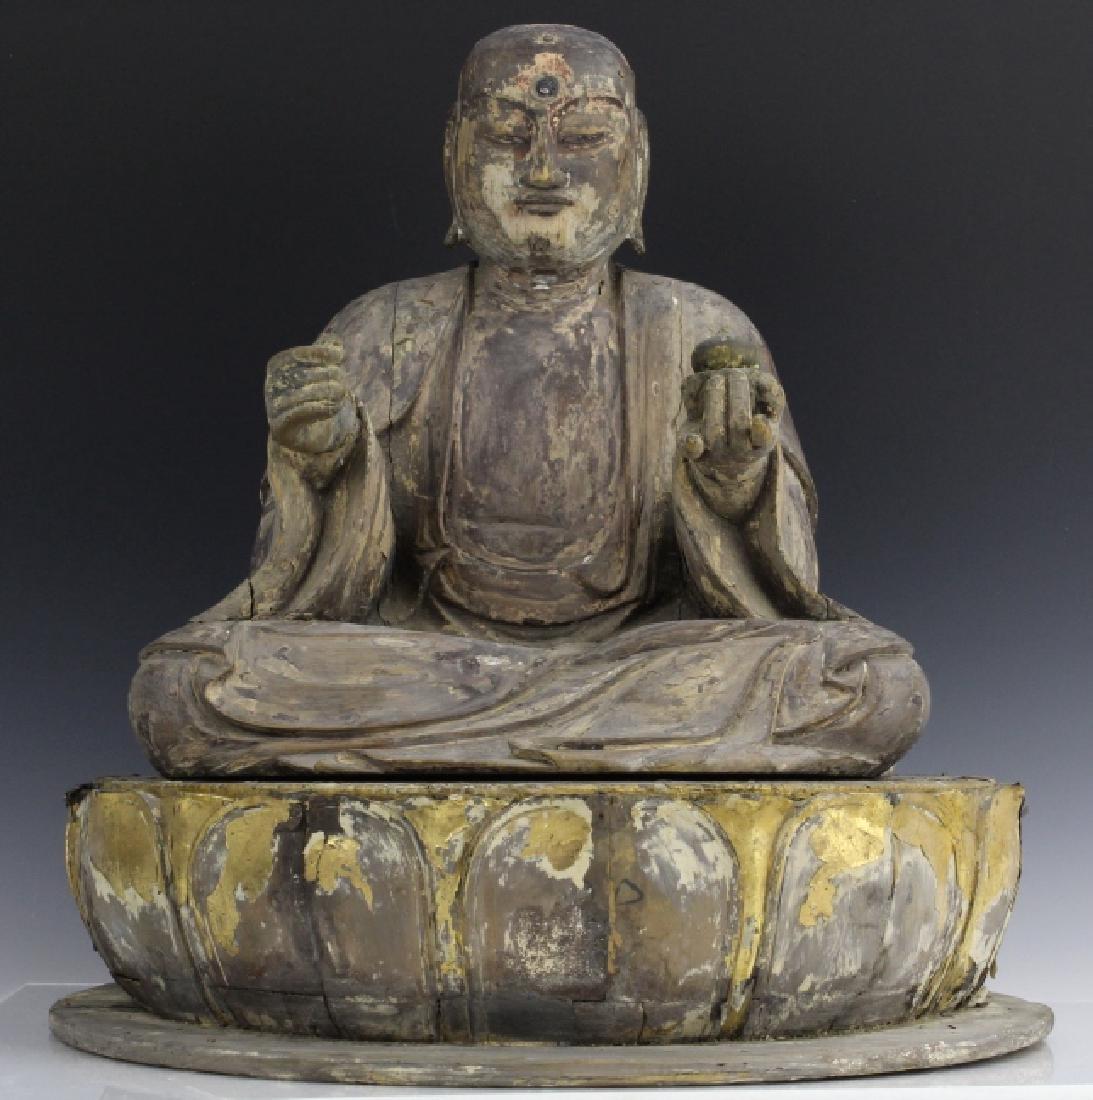 Muromachi Period c. 1600 AD Japanese Wood Buddha Statue